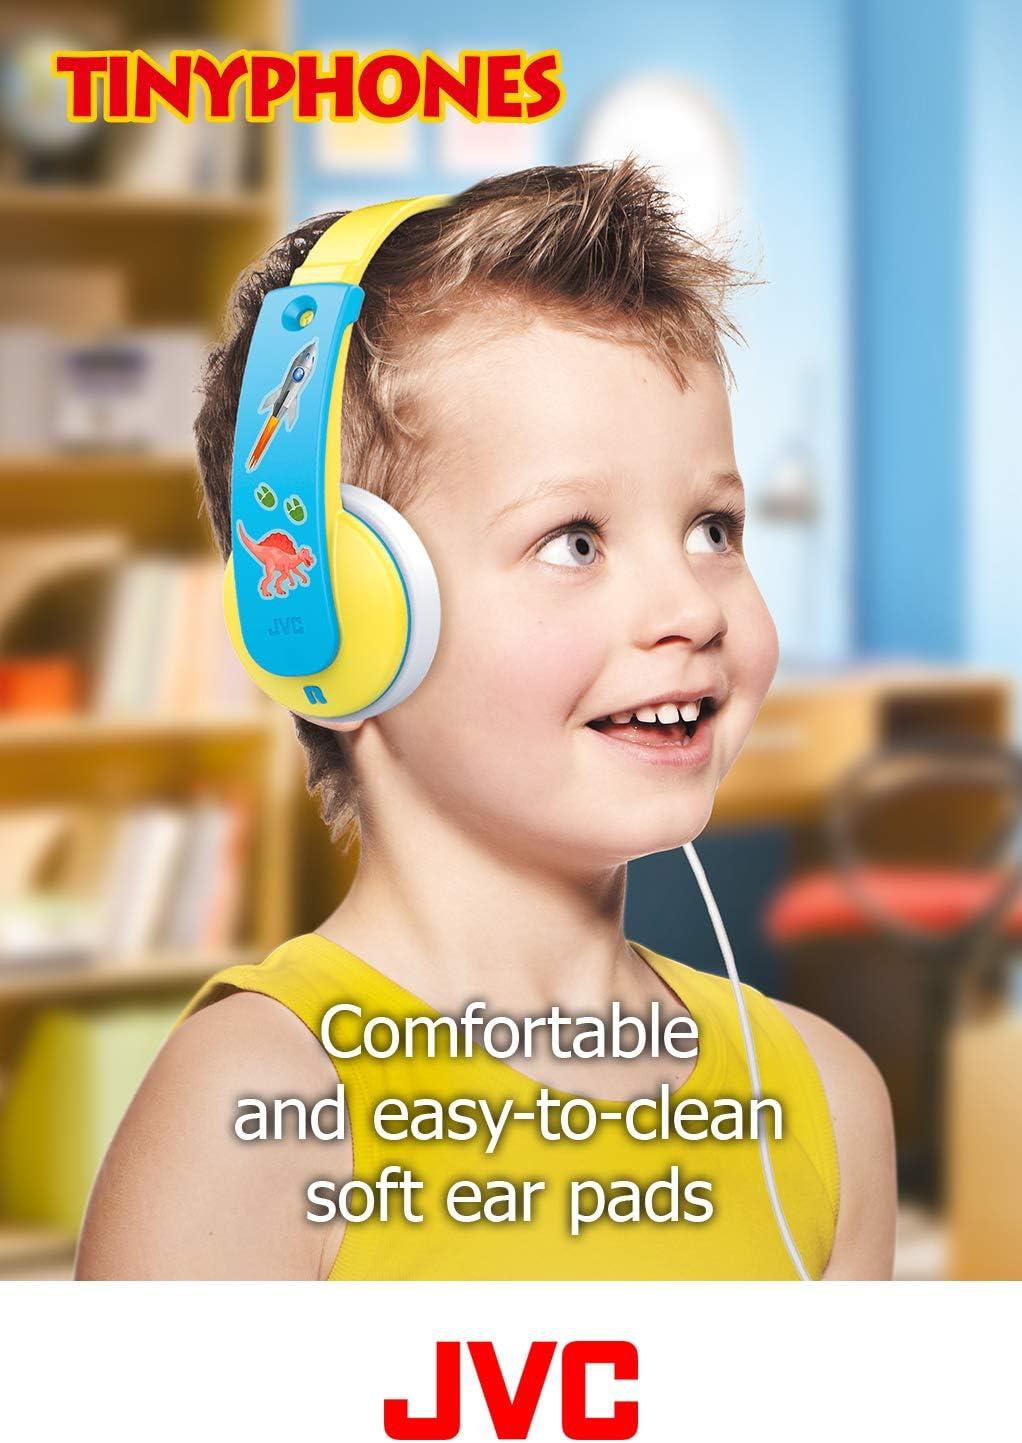 Jvc Hakd7y Kinder Tinyphone Mit Lautstärkebegrenzung Elektronik